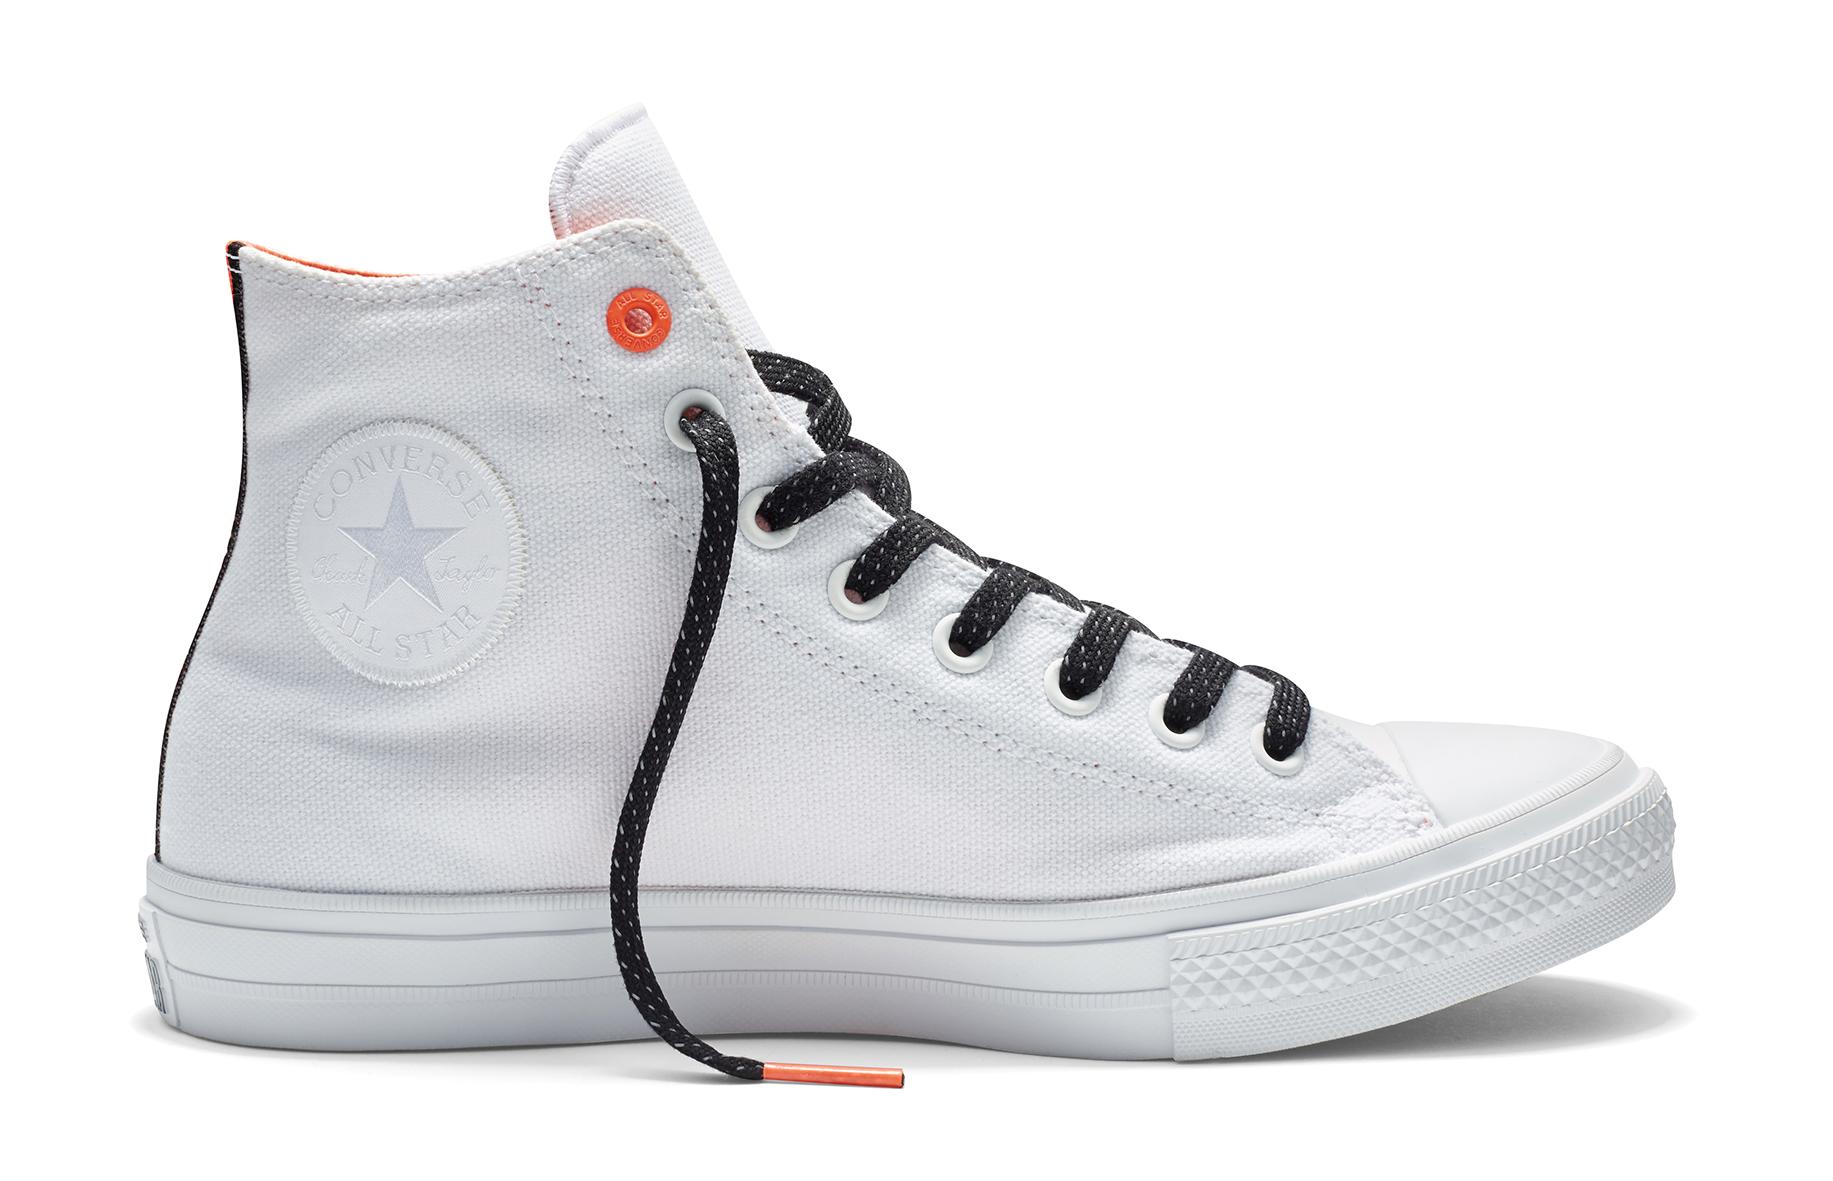 UNISEX_CT AS SHIELD CANVAS II HI White_Lava_Gum - 319 nuevos soles.jpg